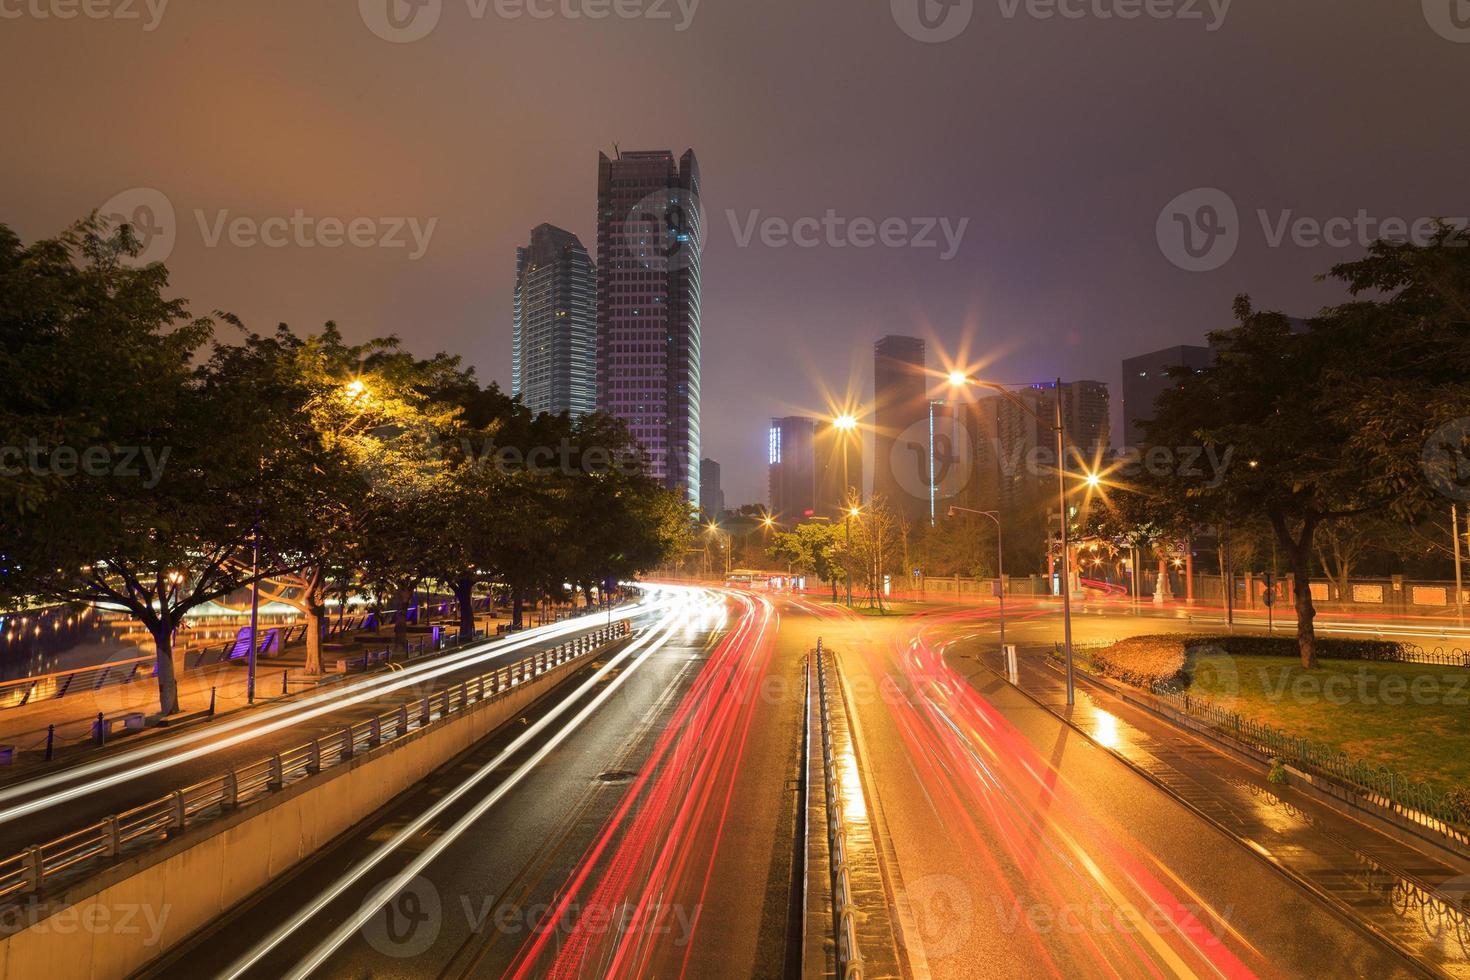 intenso tráfico por la noche en chengdu, china foto